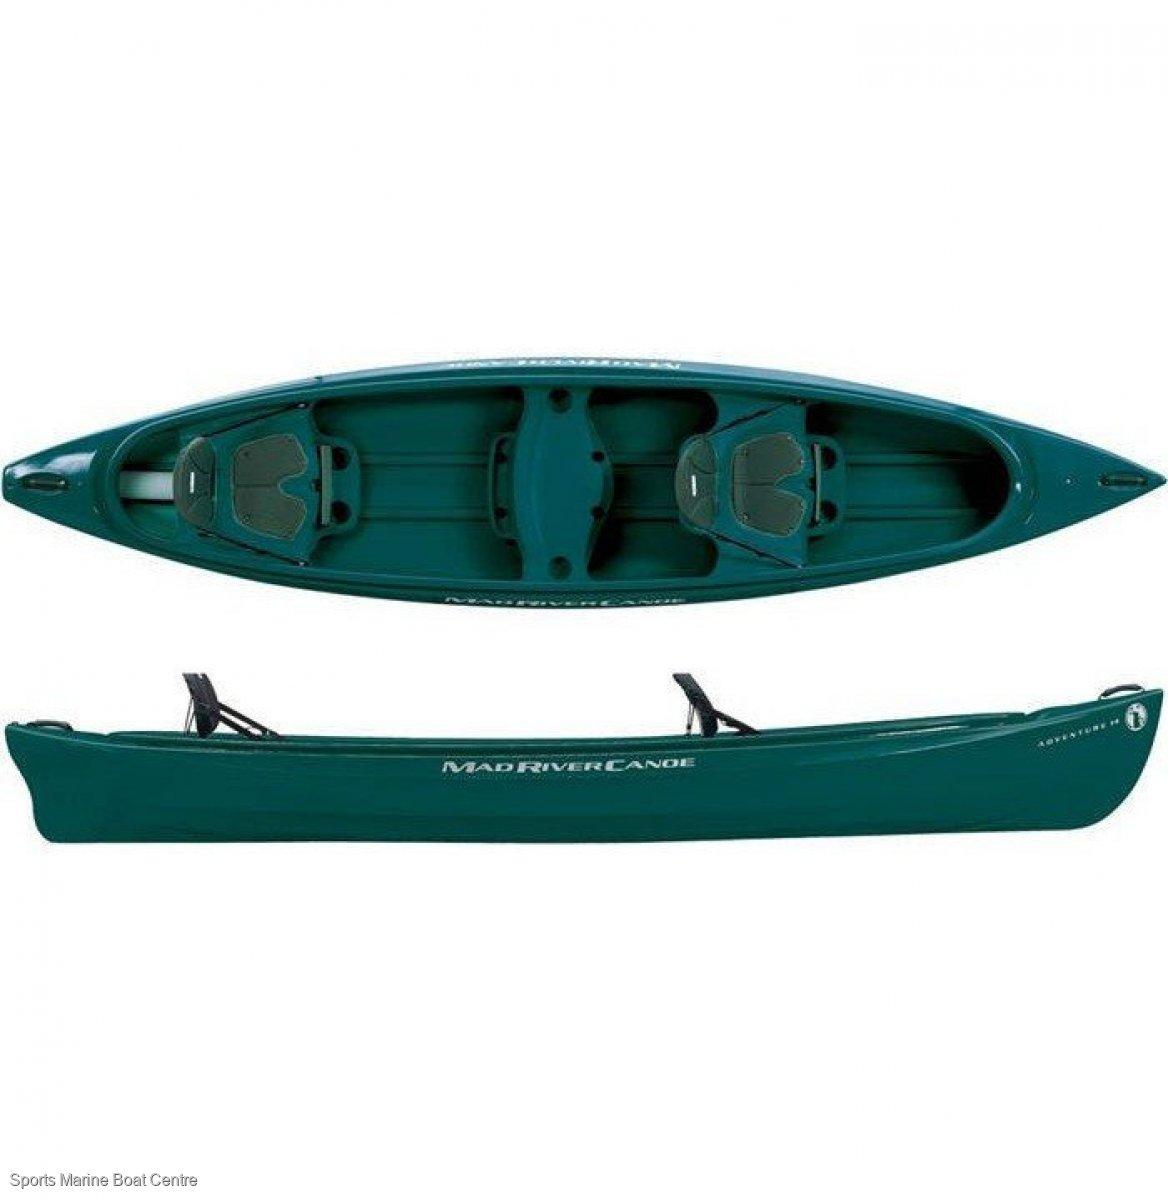 Mad River Adventure 14 Canoe 3 seater